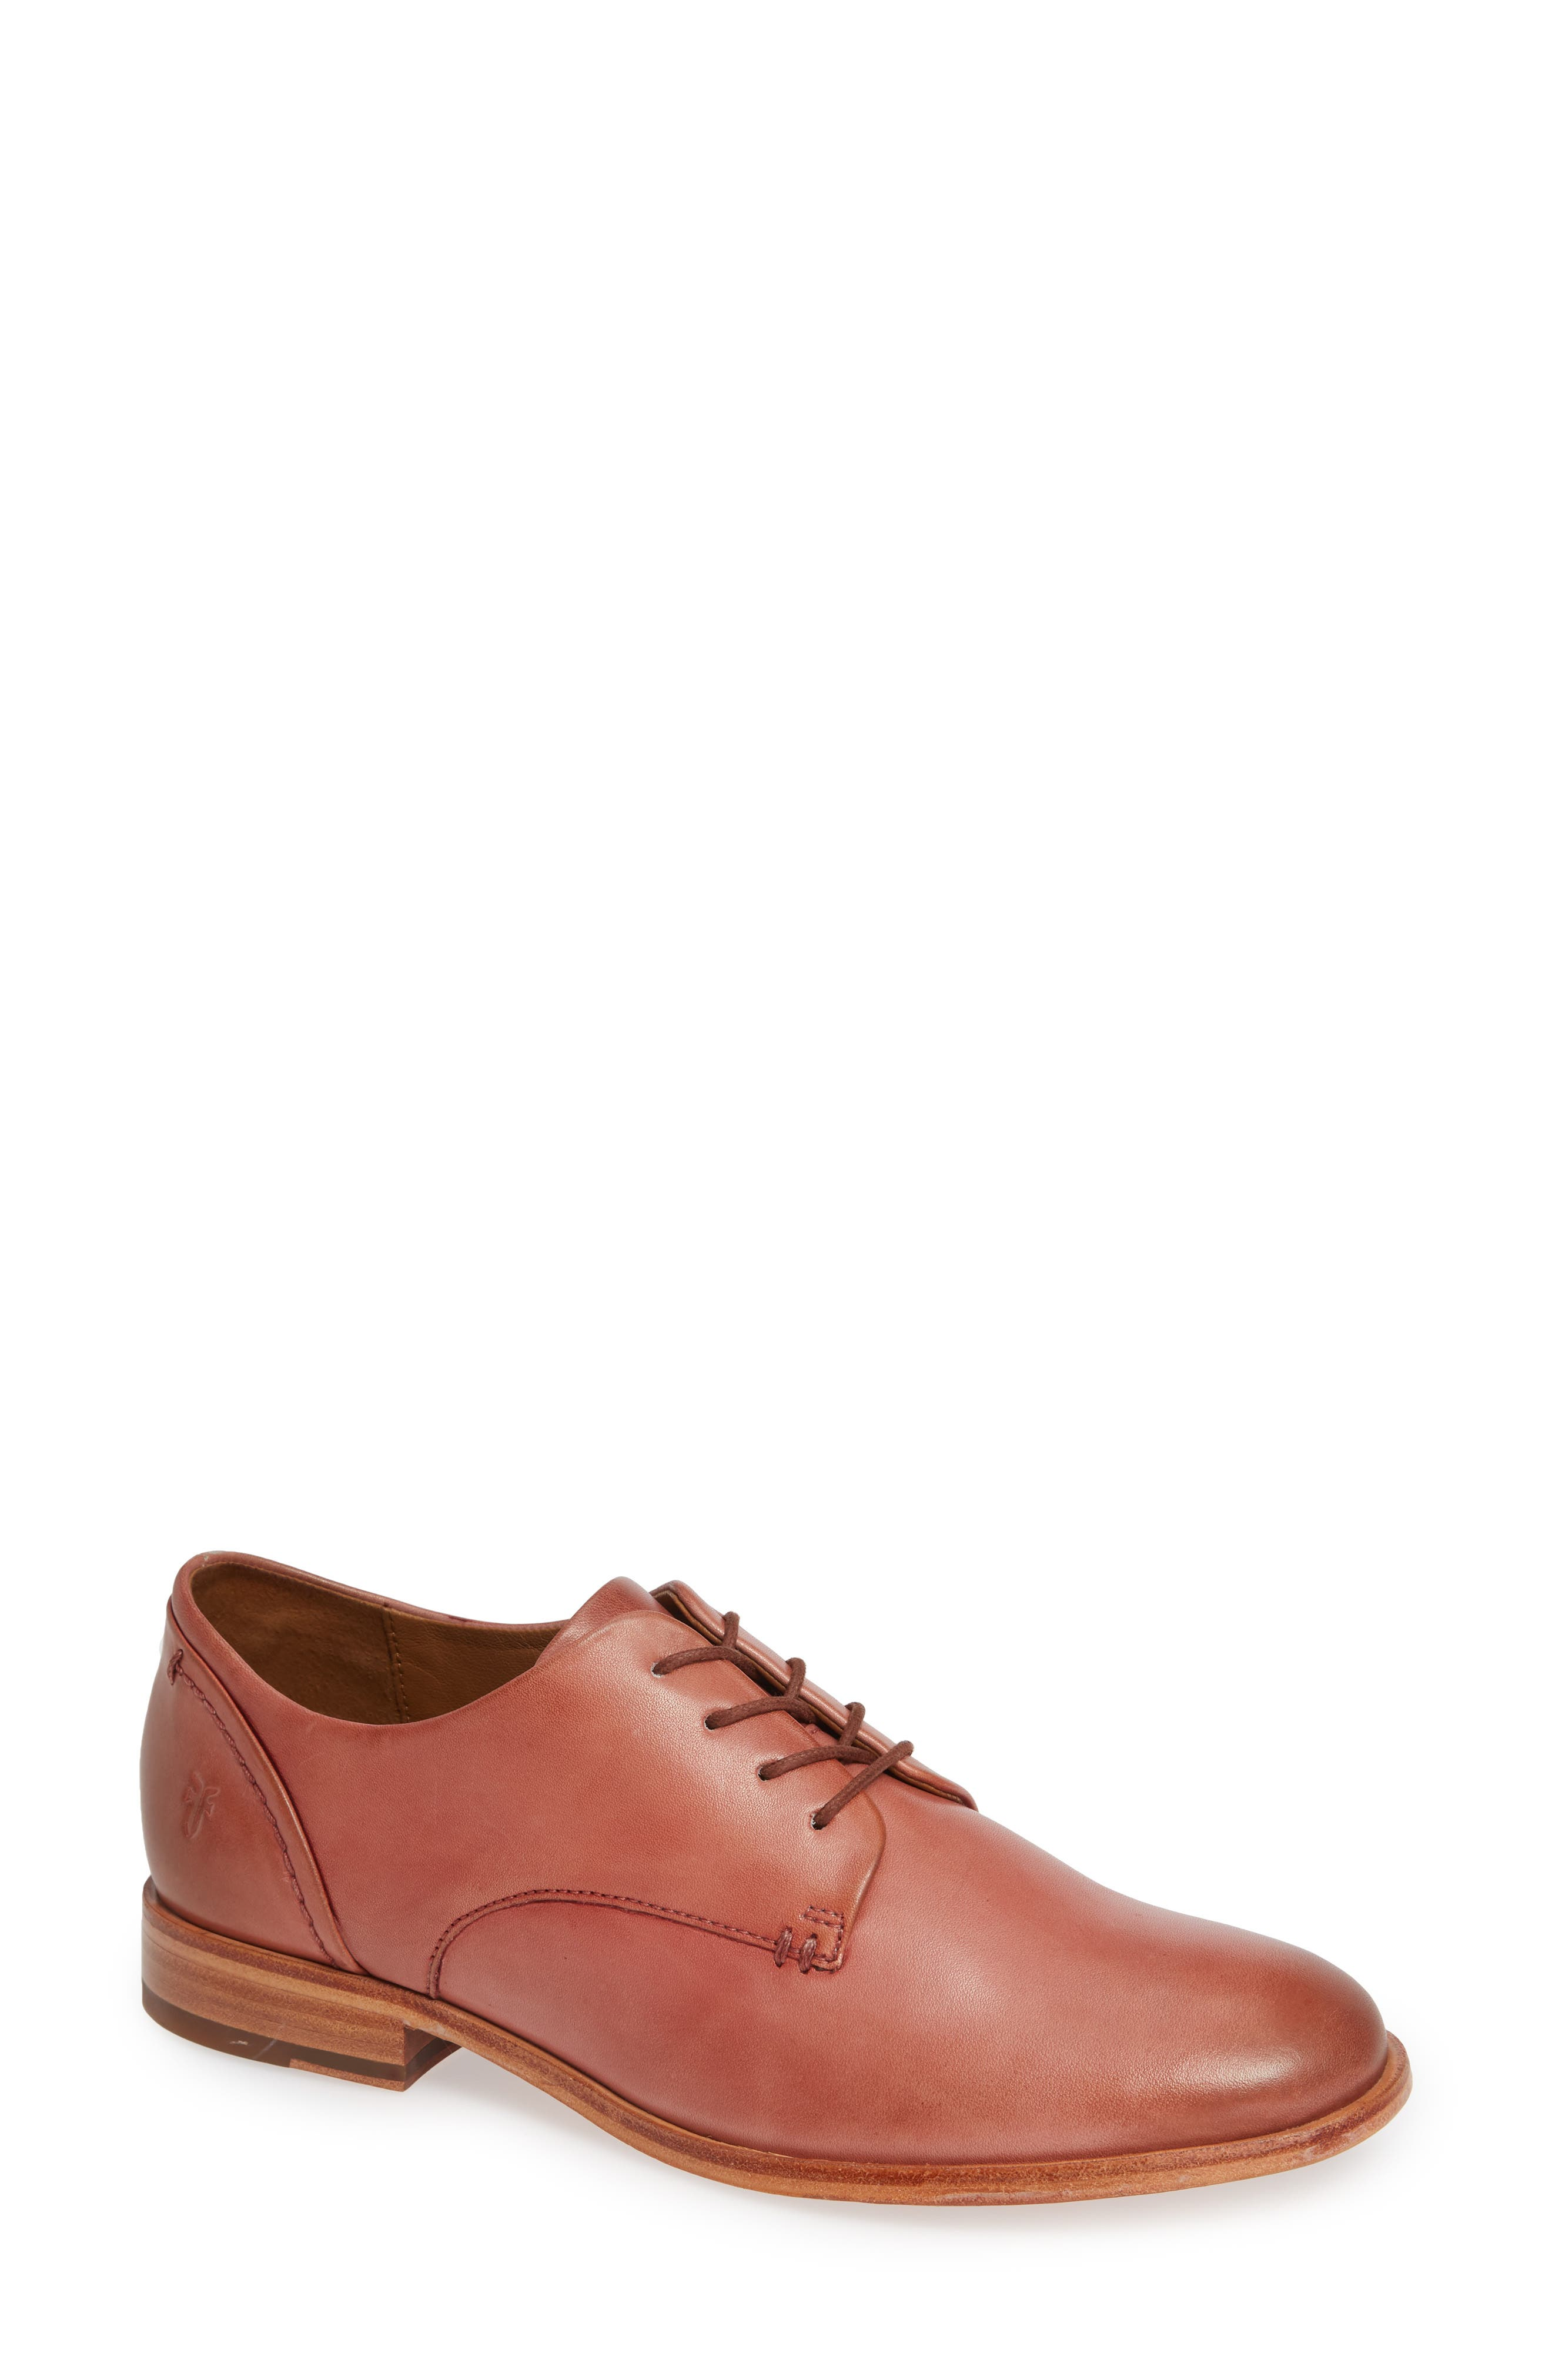 Frye Elyssa Oxford, Pink